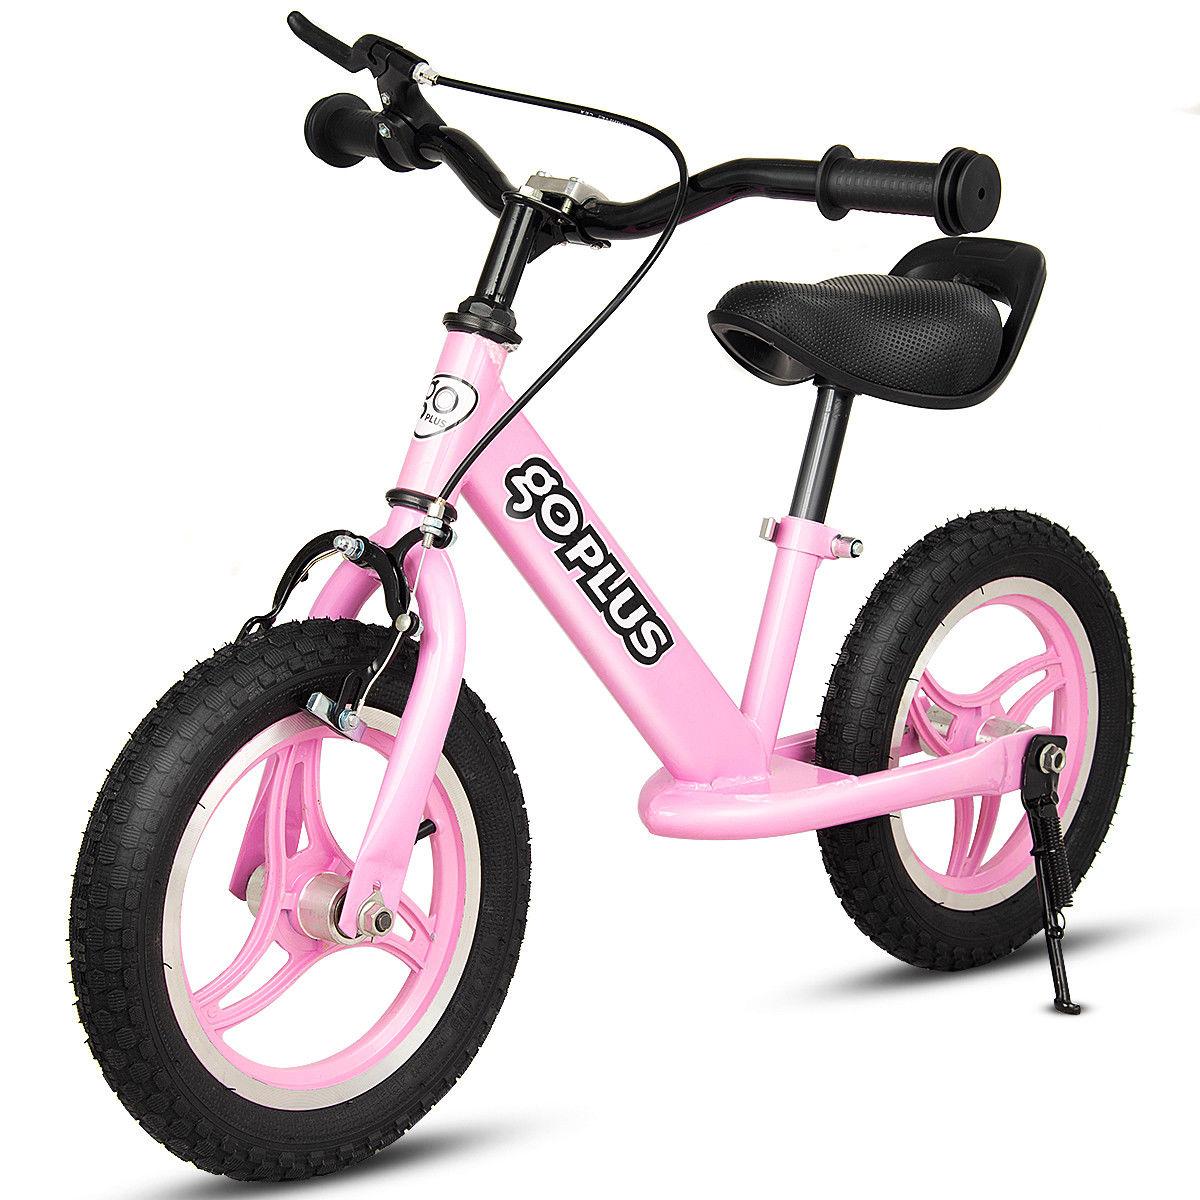 Goplus 12'' Kids Balance Bike W/ Kickstand Brake Cycling Outdoor Sports Learn To Ride